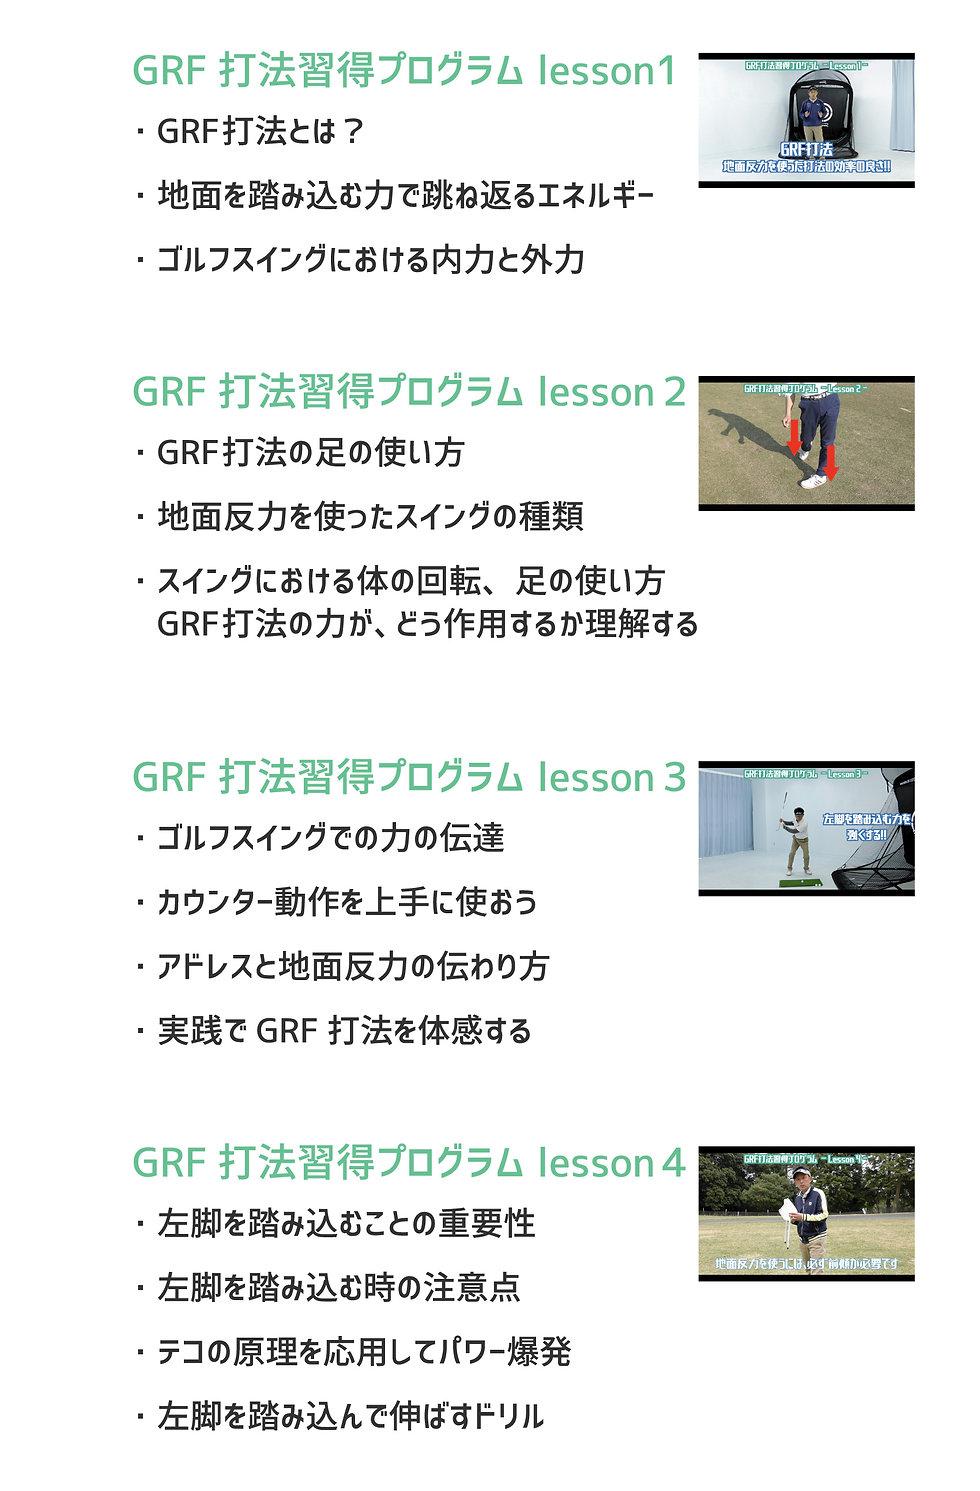 GRF-LP15.jpg